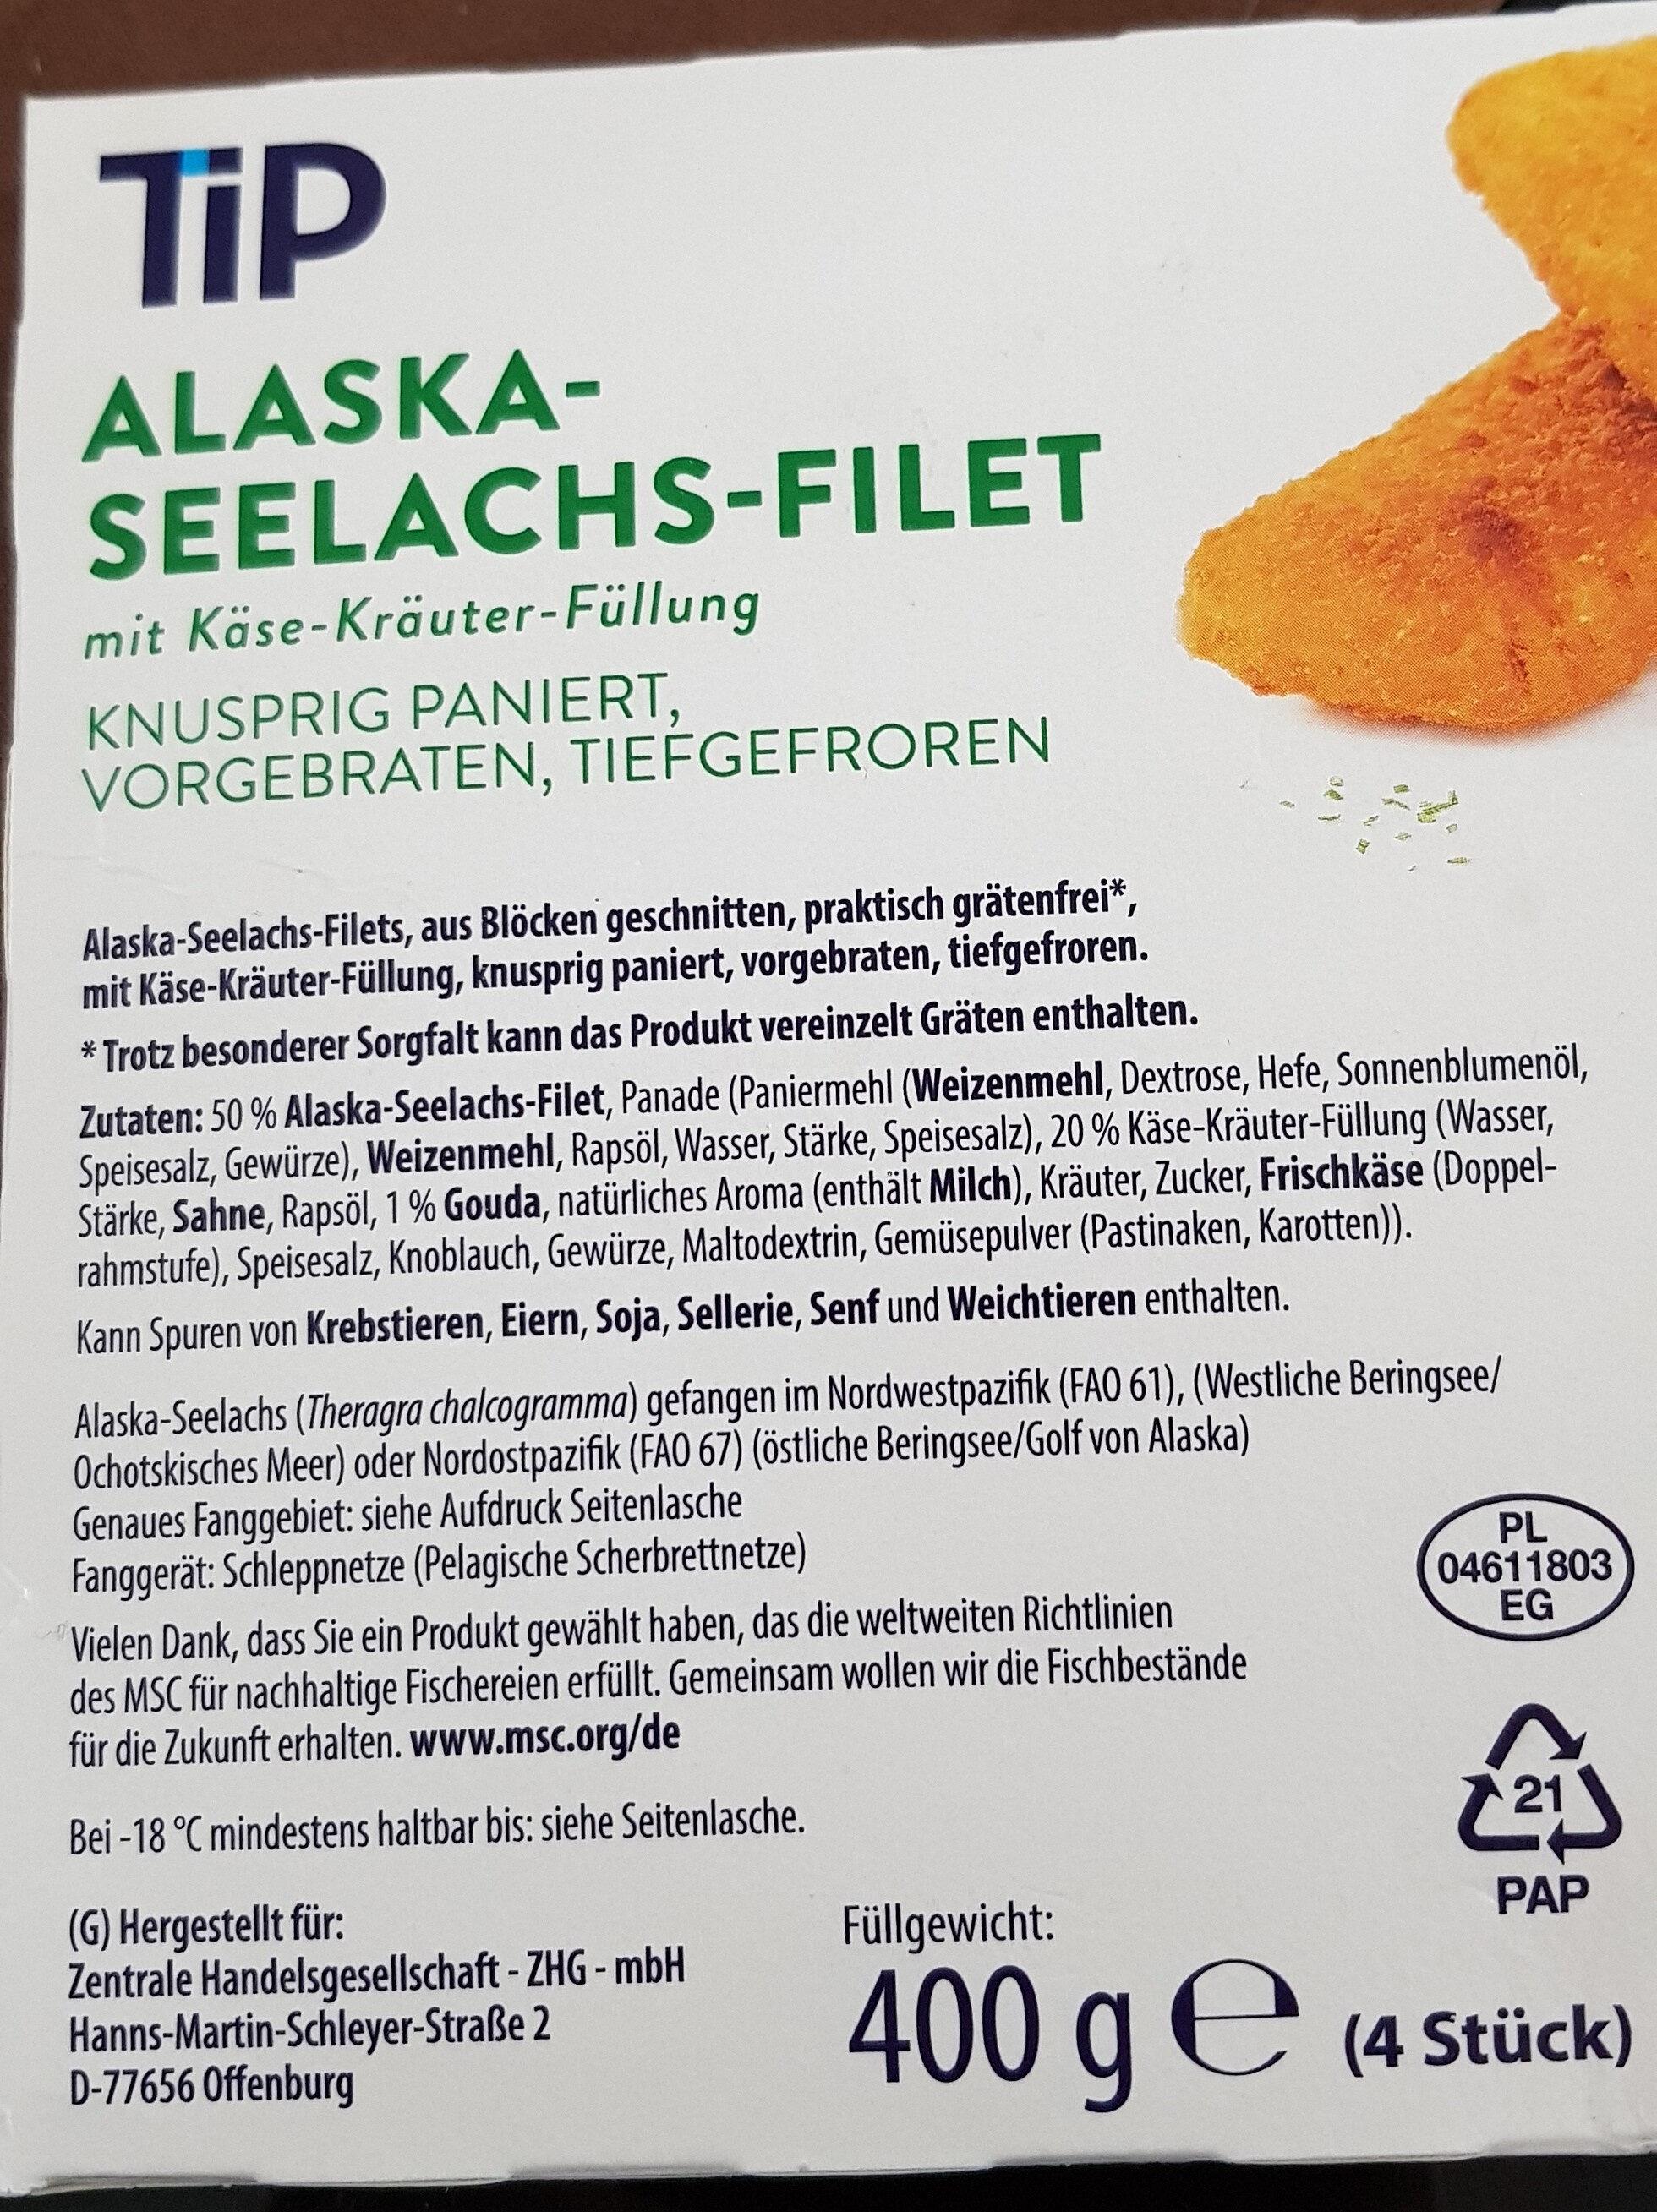 Alaska-Seelachs-Filet mit Käse-Kräuter-Füllung - Ingredients - de